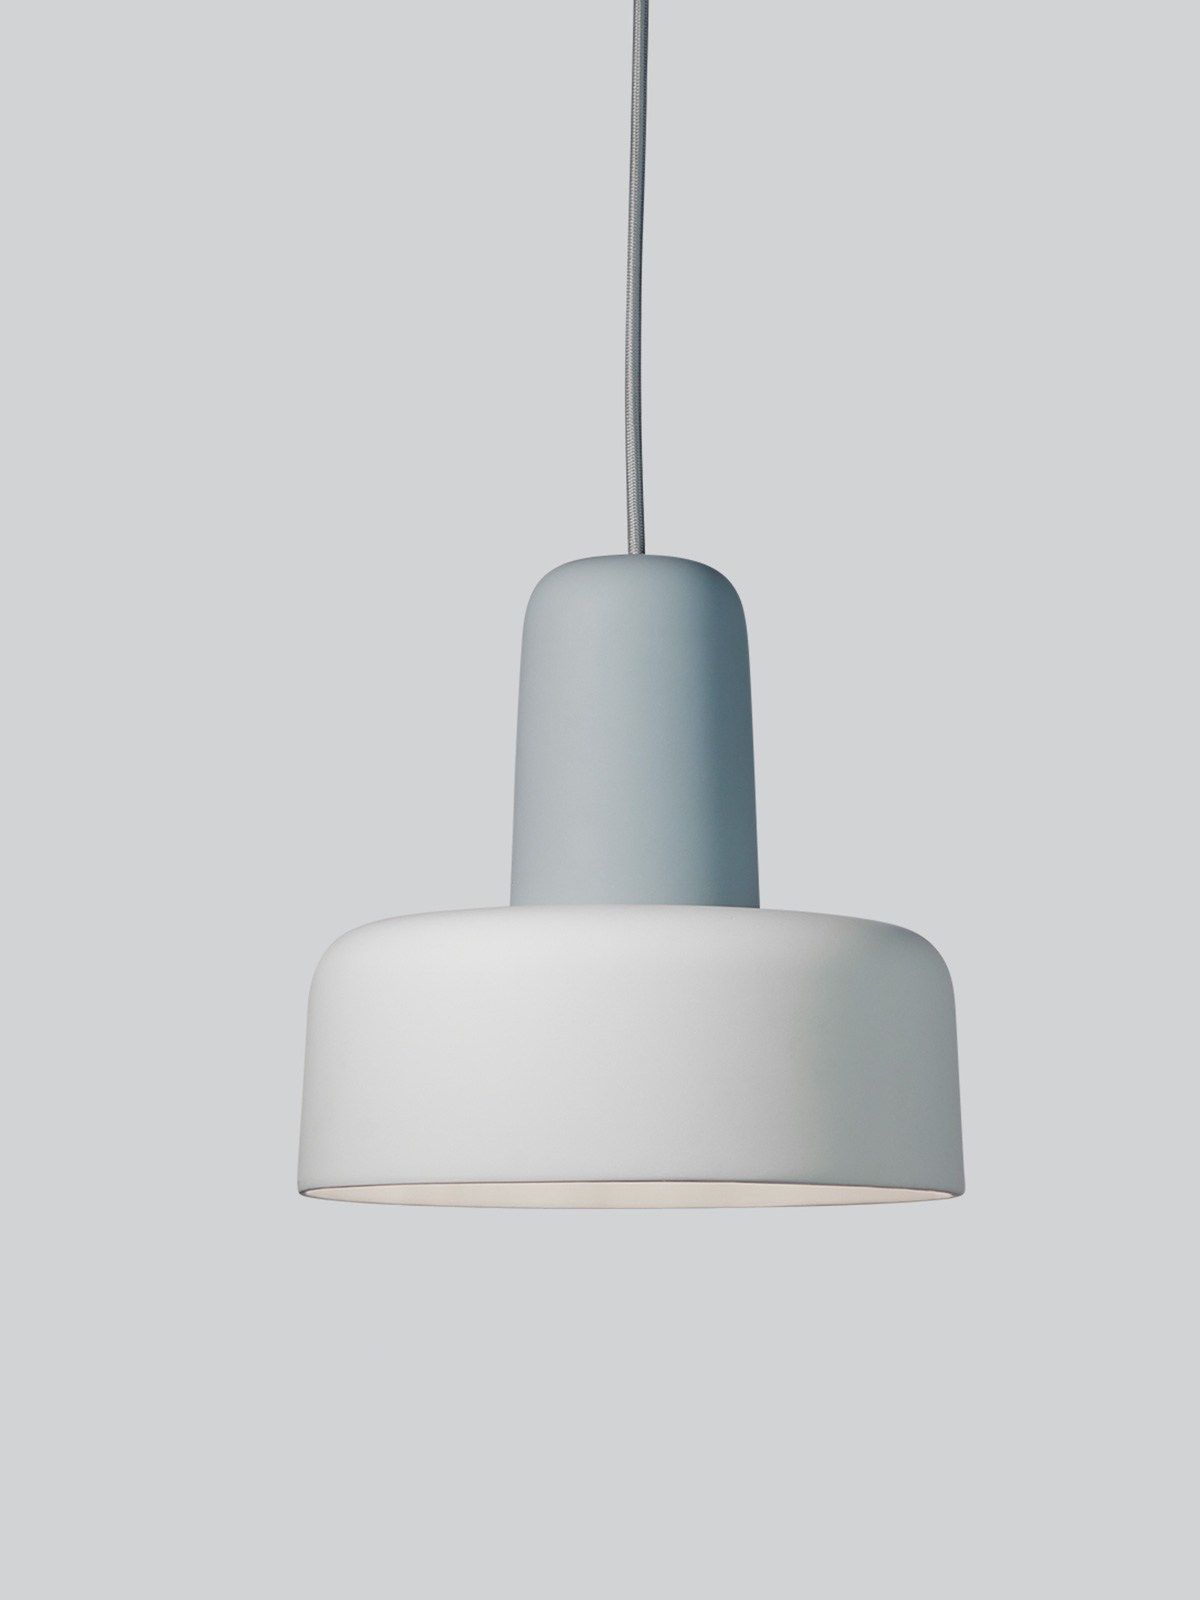 Meld Lampen Leuchten Designerleuchten Online Berlin Design Durchmesser 24 Design Leuchten Lampen Und Leuchten Berlin Design